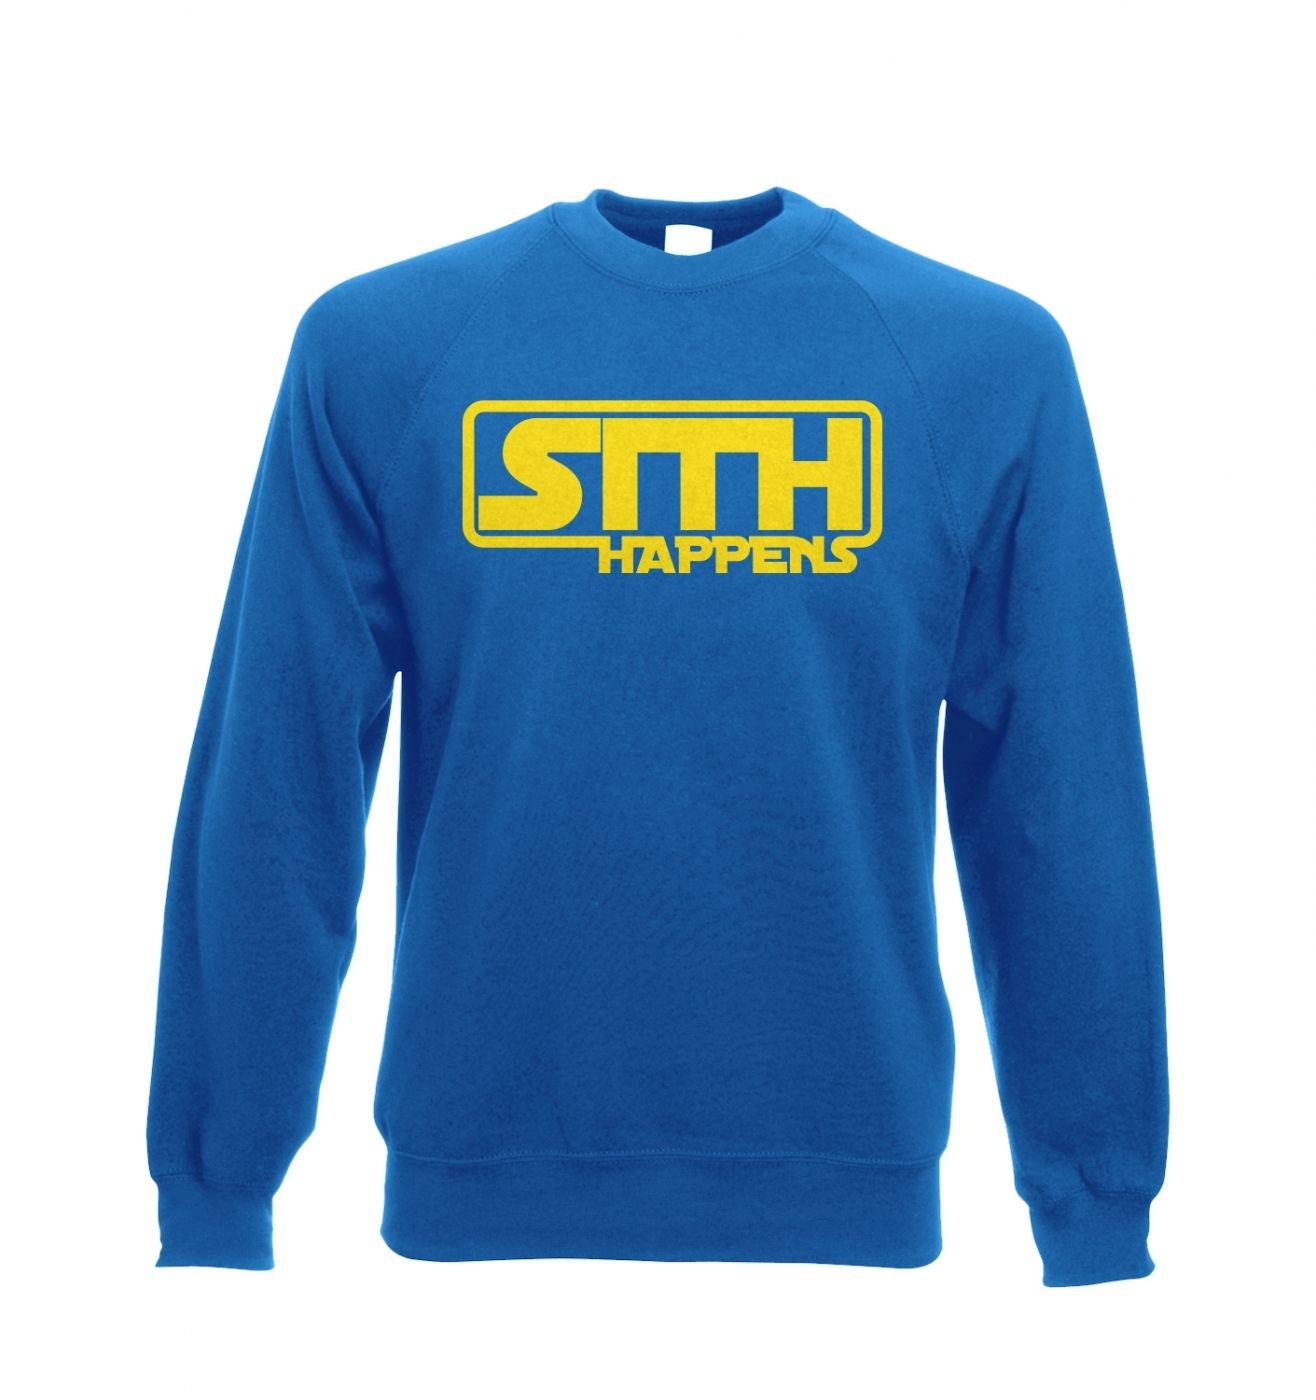 Sith Happens Adult Crewneck Sweatshirt